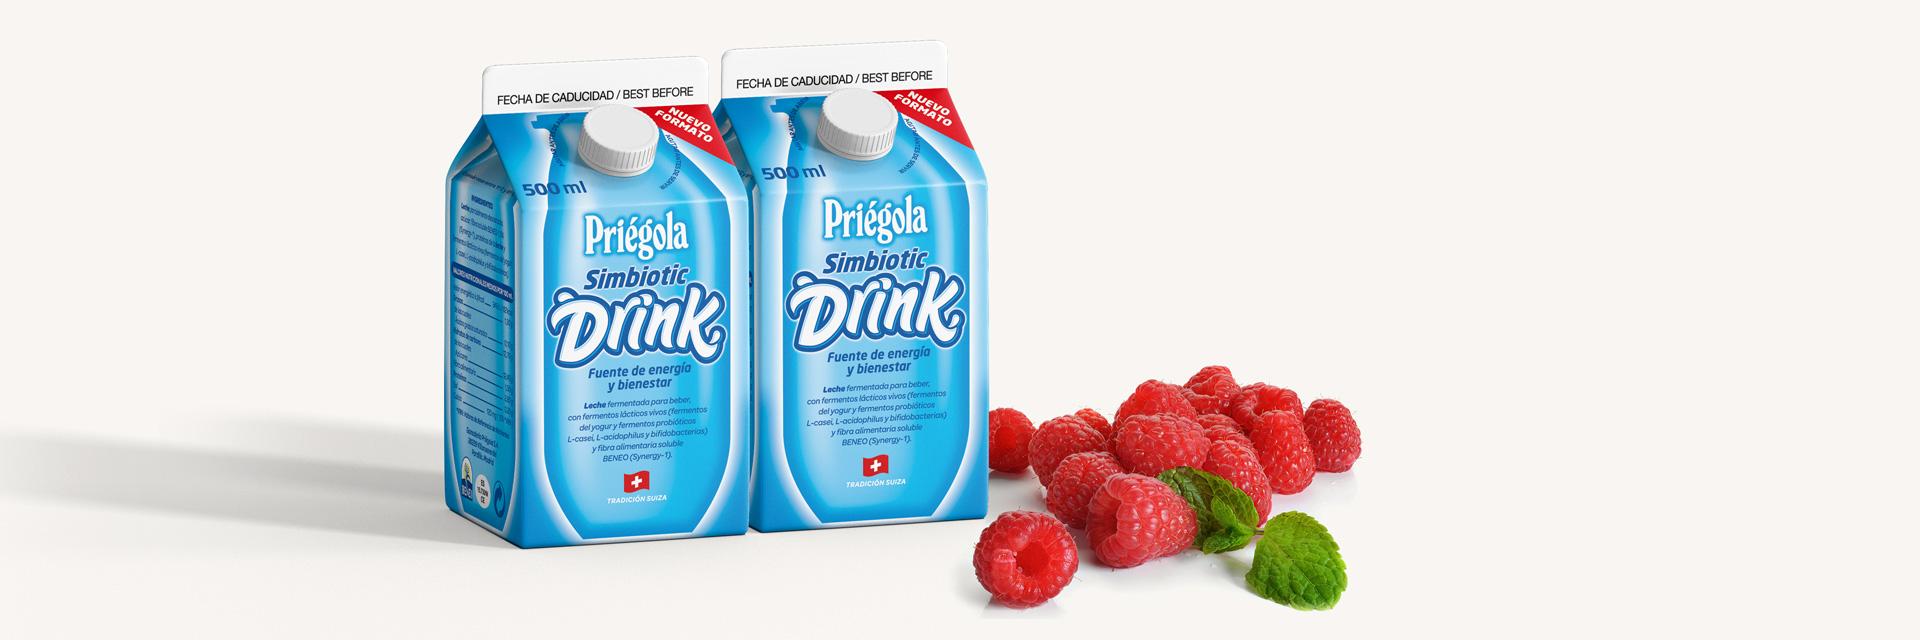 Priegola Simbiotic Drink